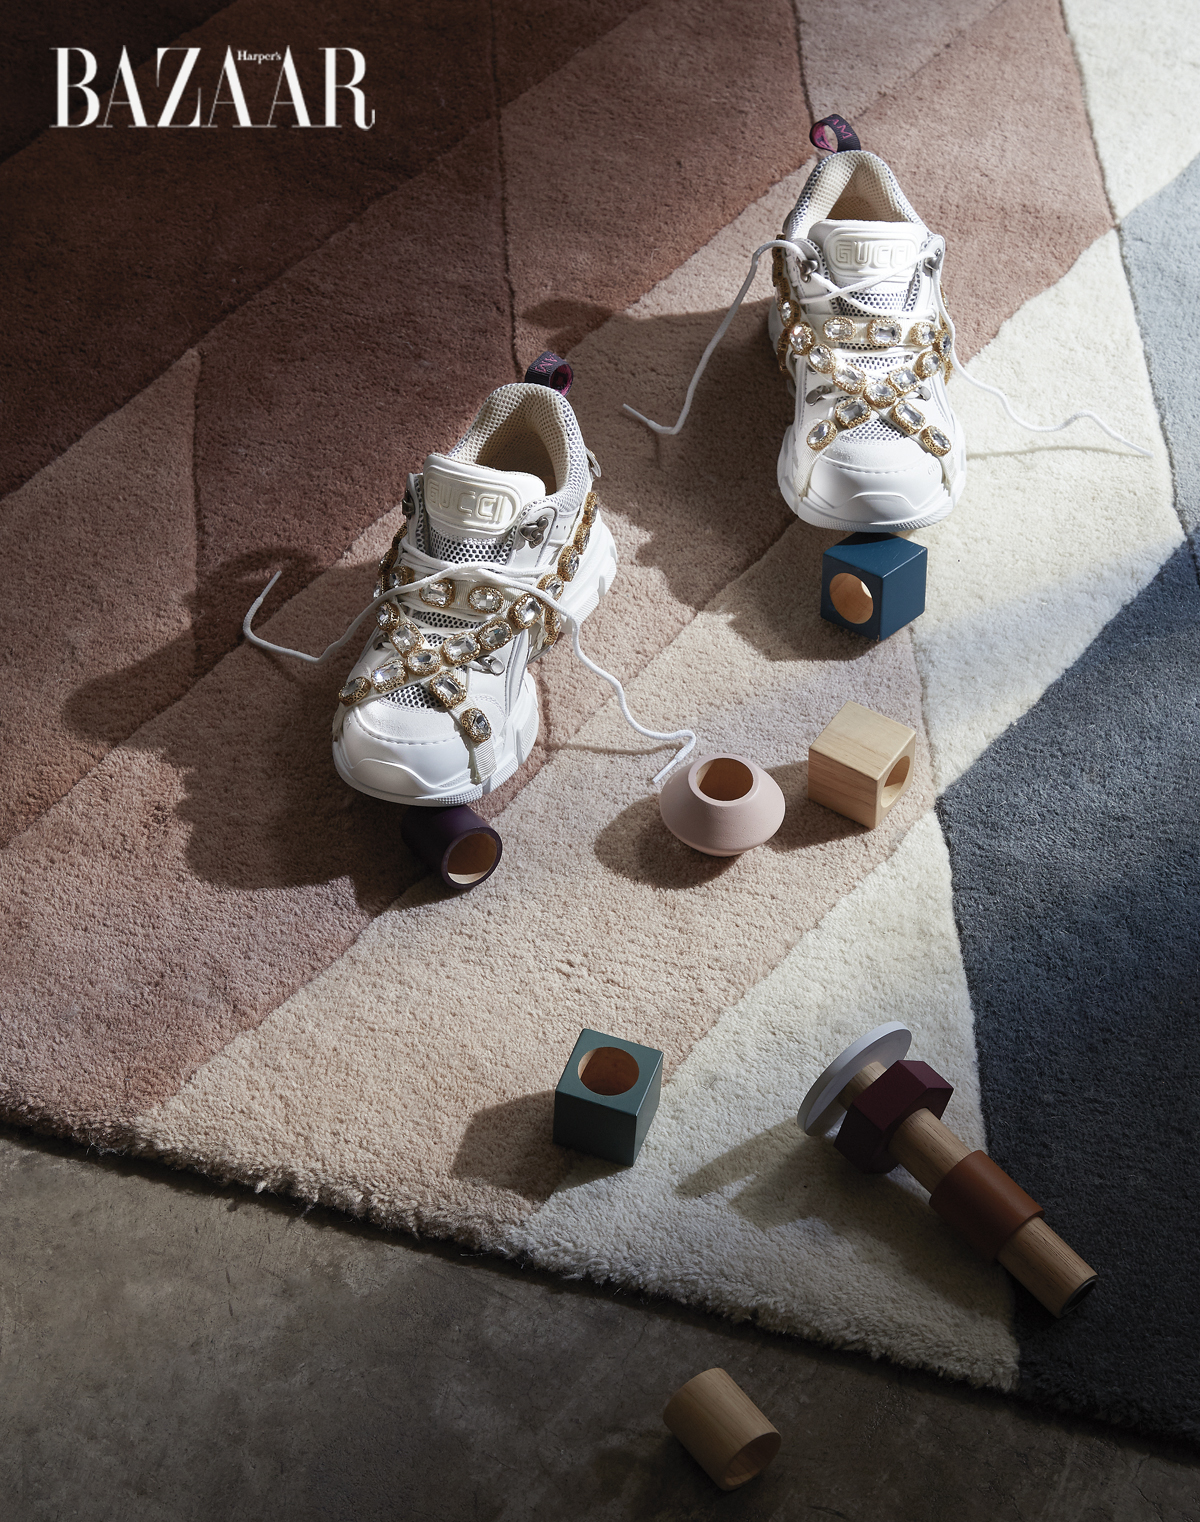 phu-kien-duoc-yeu-thich-nhat-gucci-sneaker-flashtrek